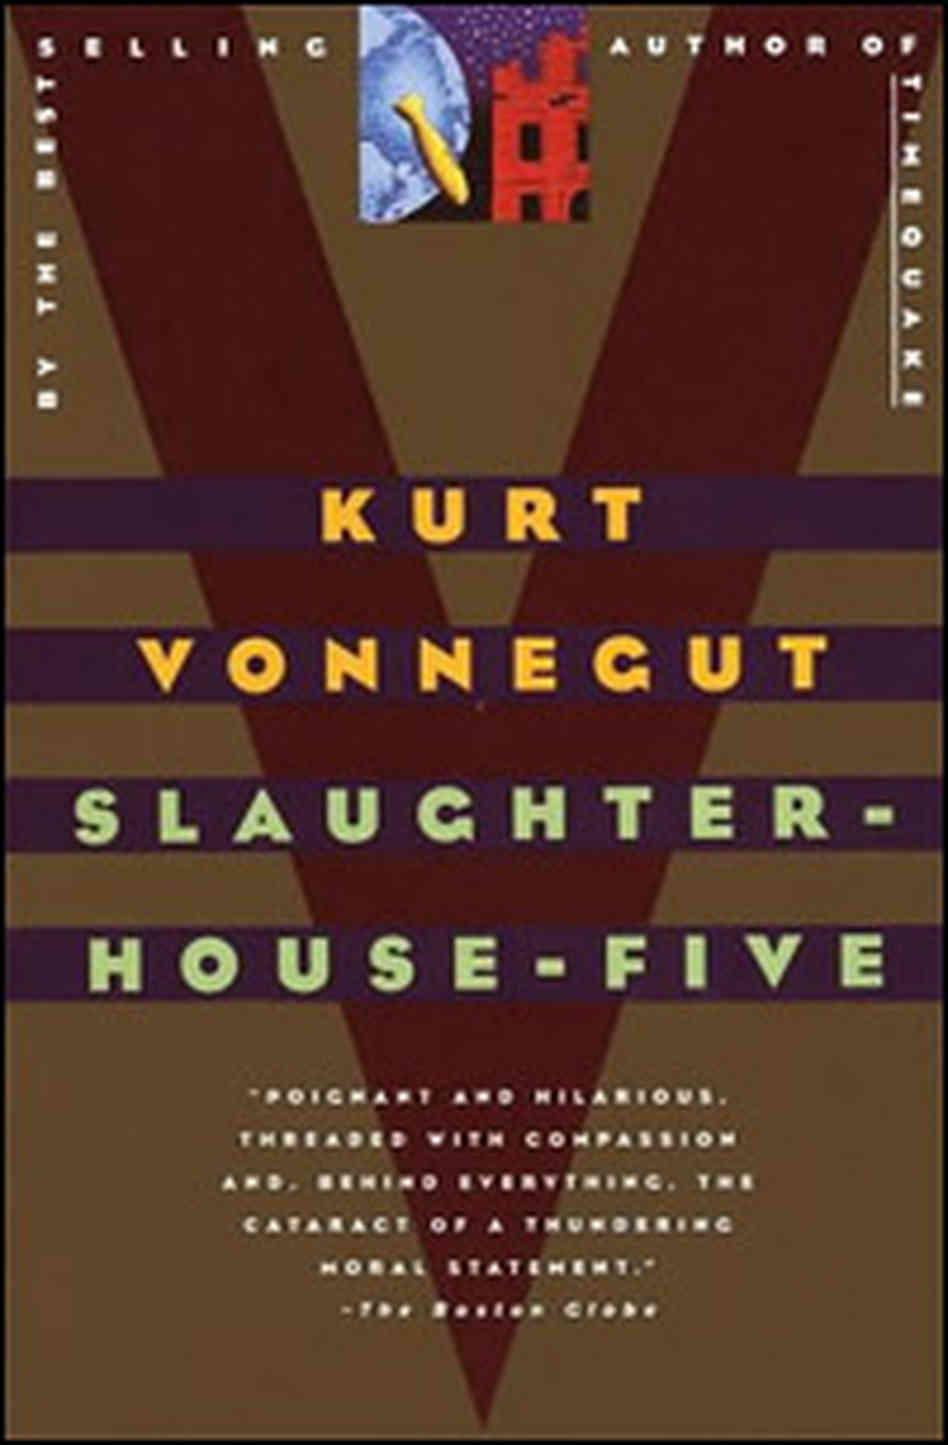 kurt vonnegut essays slaughterhouse five essay production merchandiser cover letter king of lost ee b e deb bb e a f cf